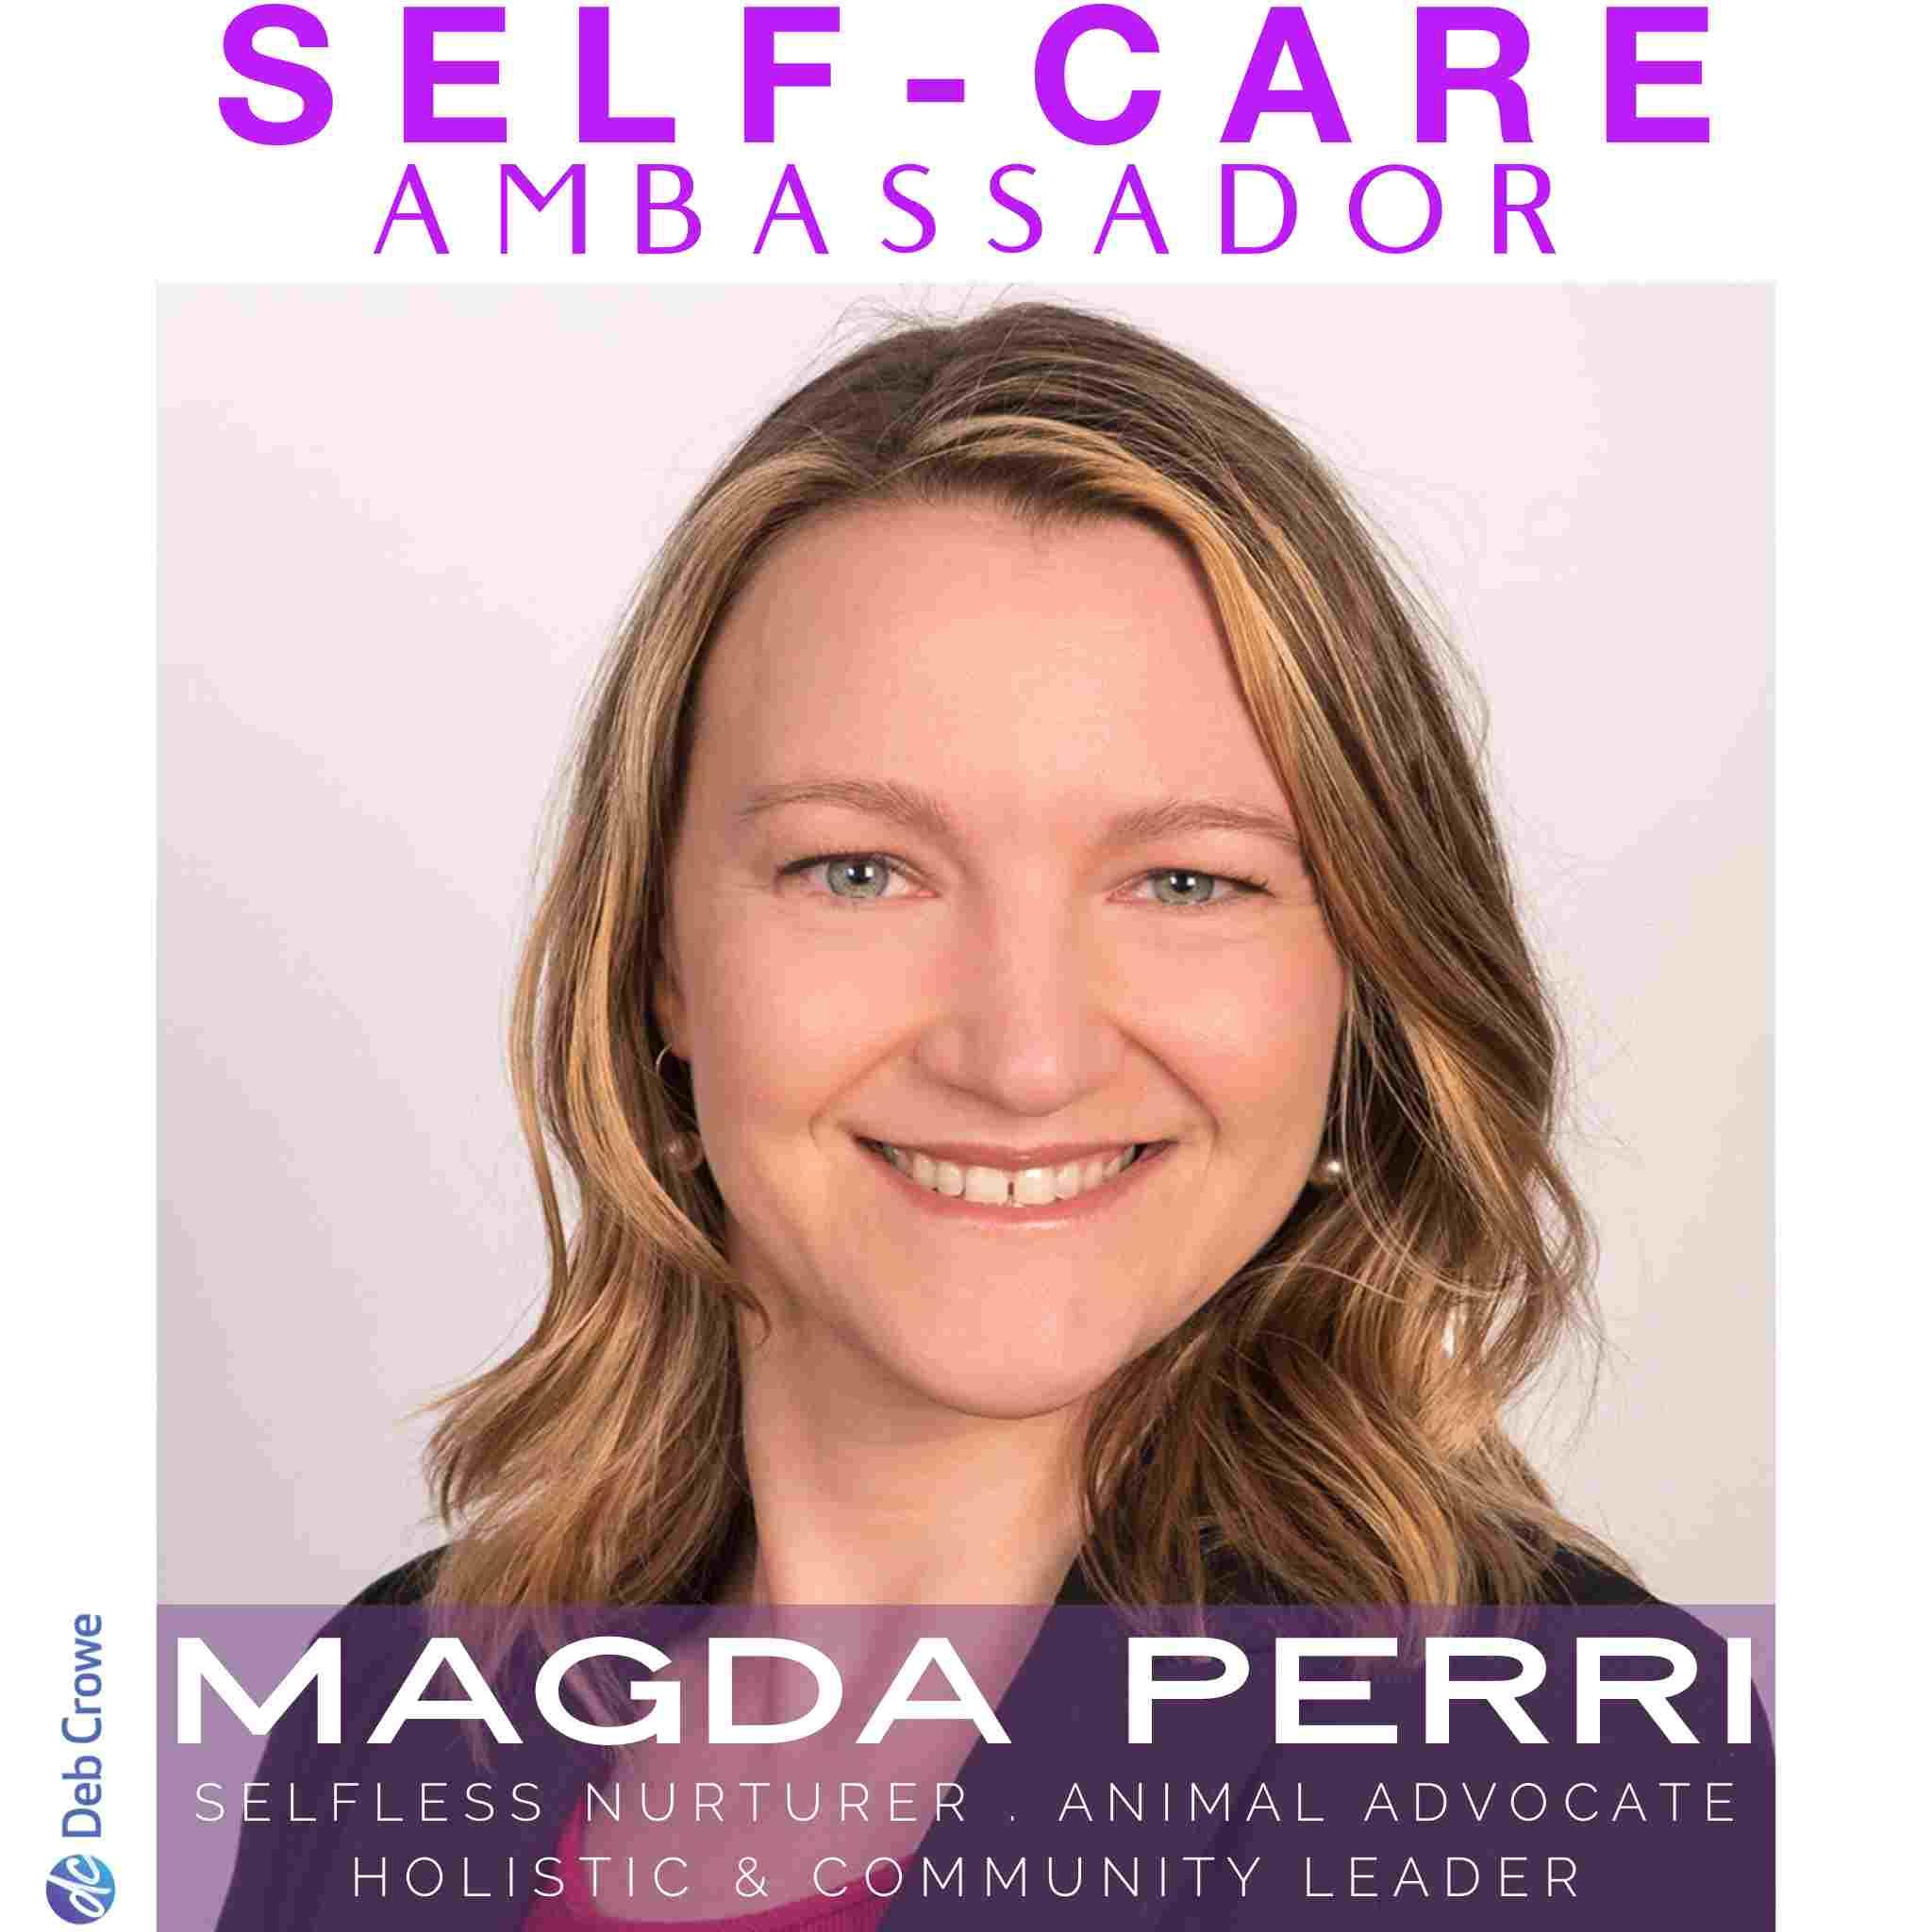 Deb Crowe Self-care Ambassador Ontario Women's Self Care Conference - Magda Perri